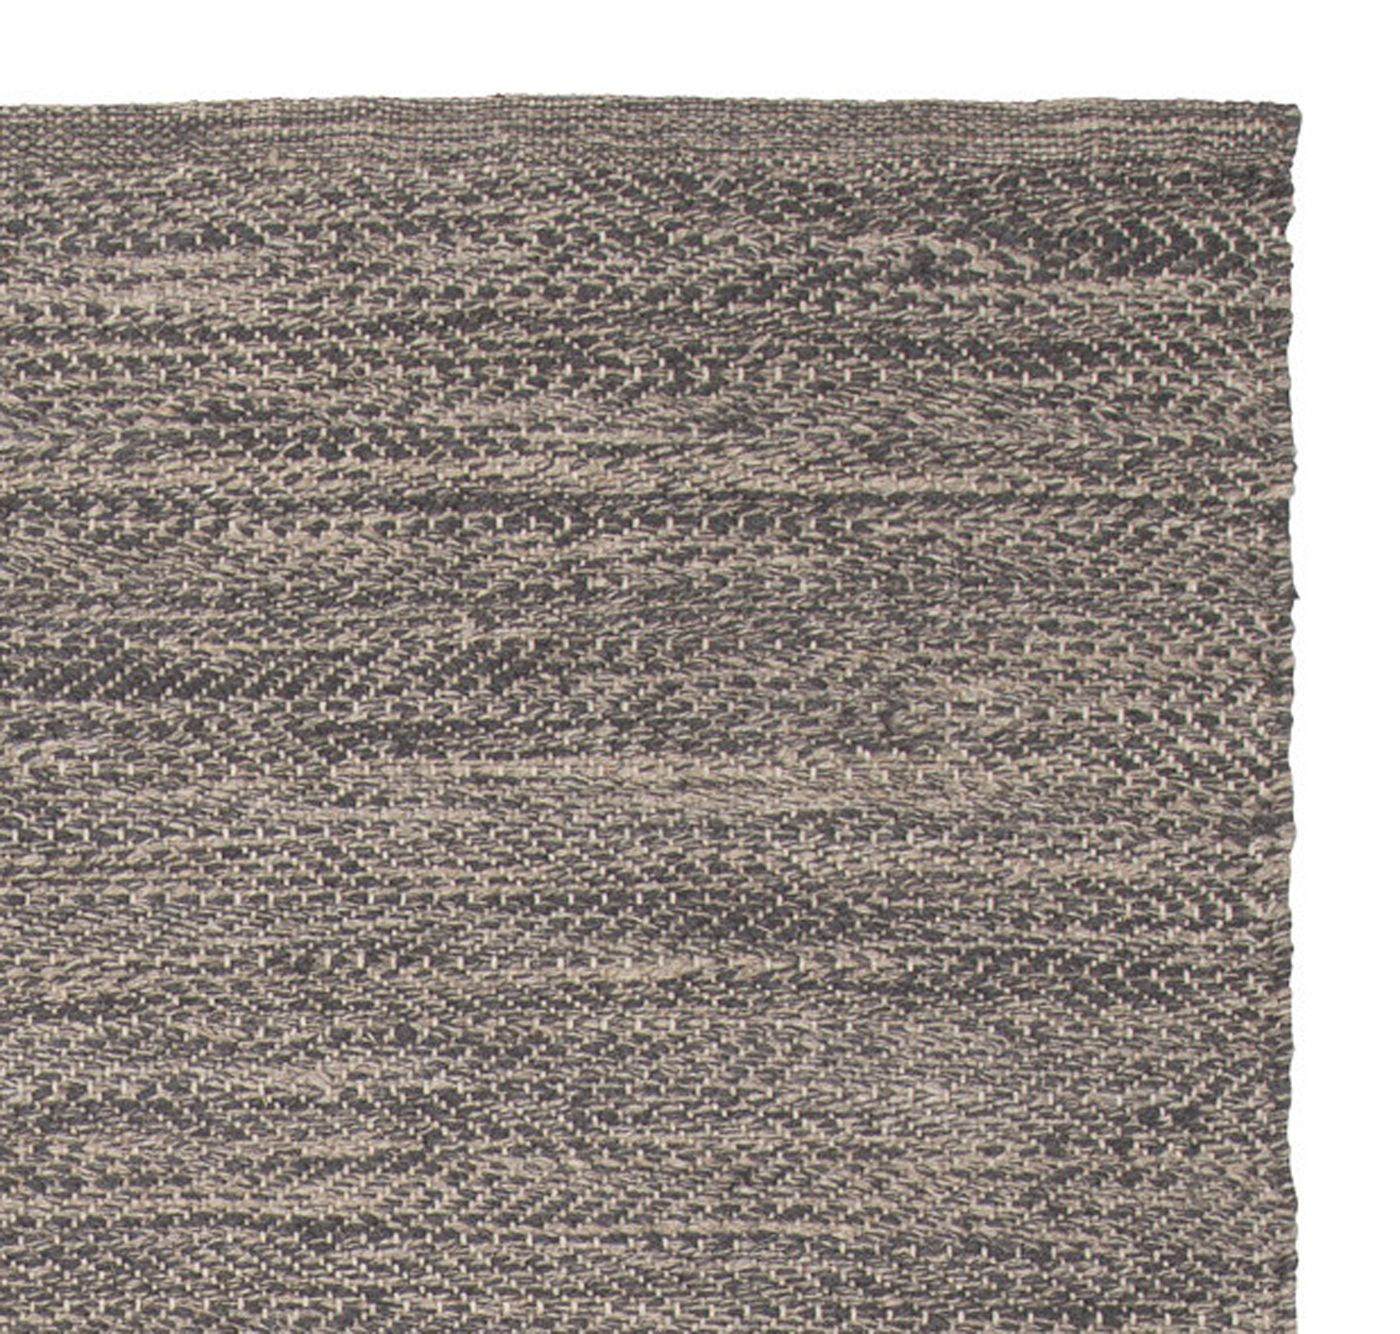 Linie Design Lia Tæppe - charcoal - 200/300